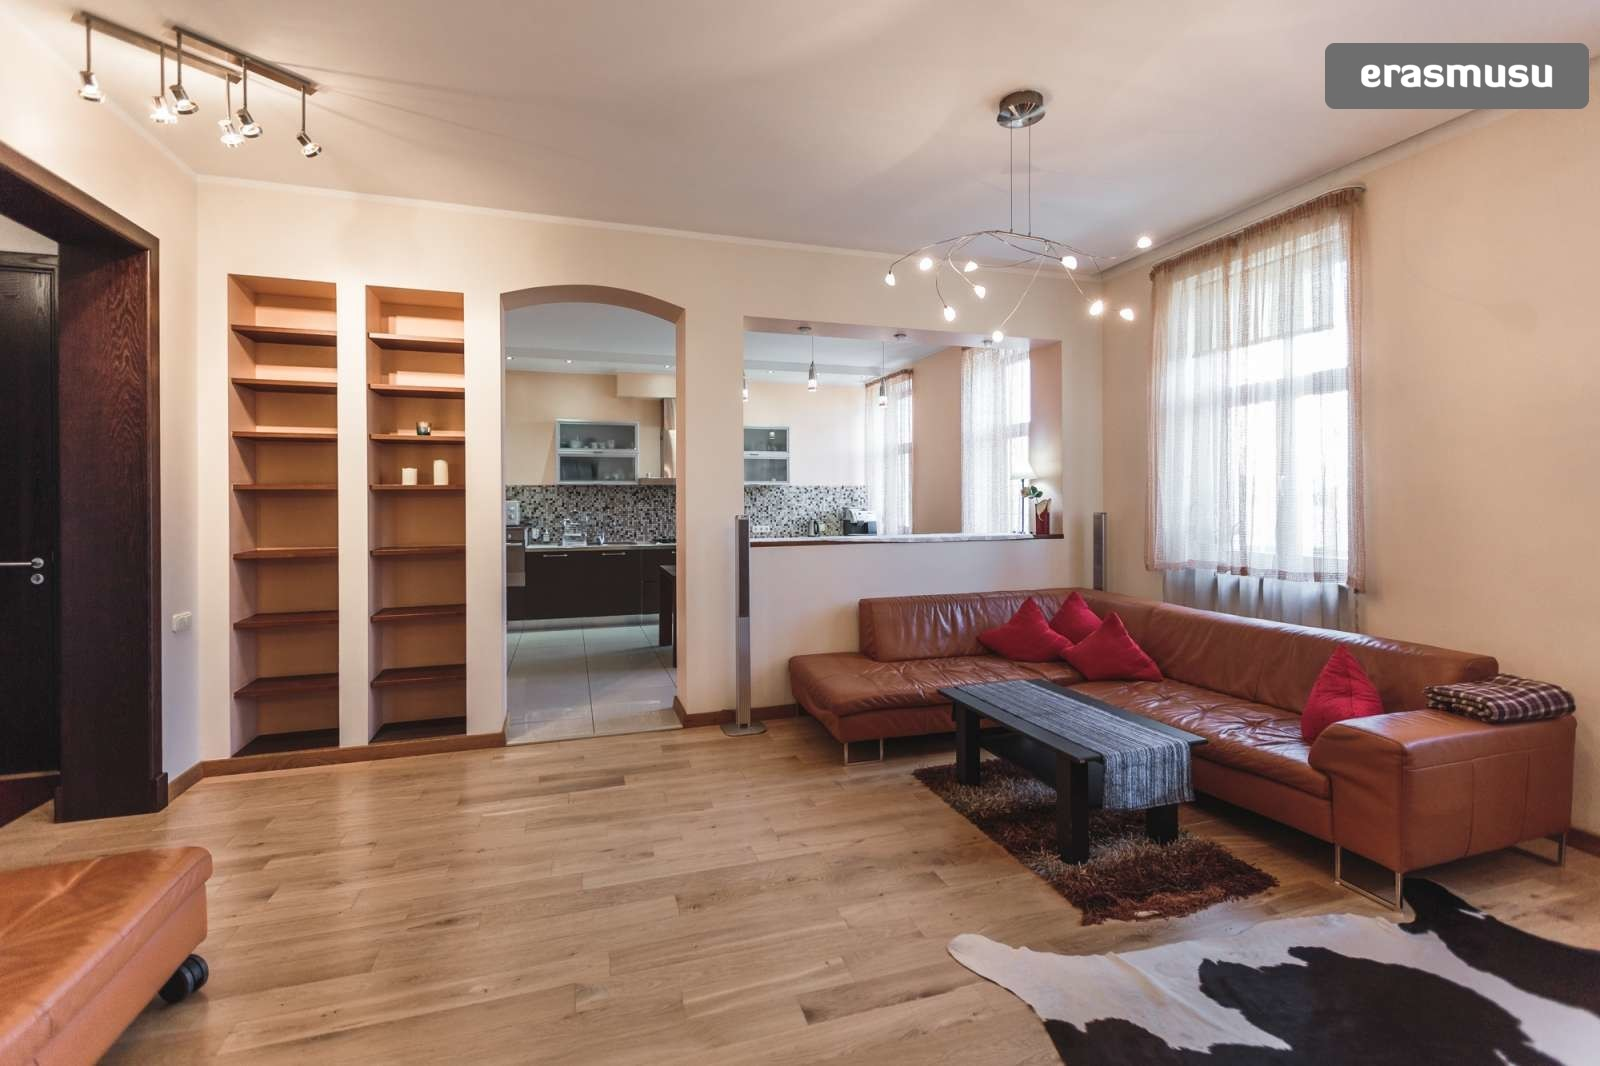 modern-4-bedroom-apartment-rent-centrs-cffee397bd0b28cb5d38cac7b